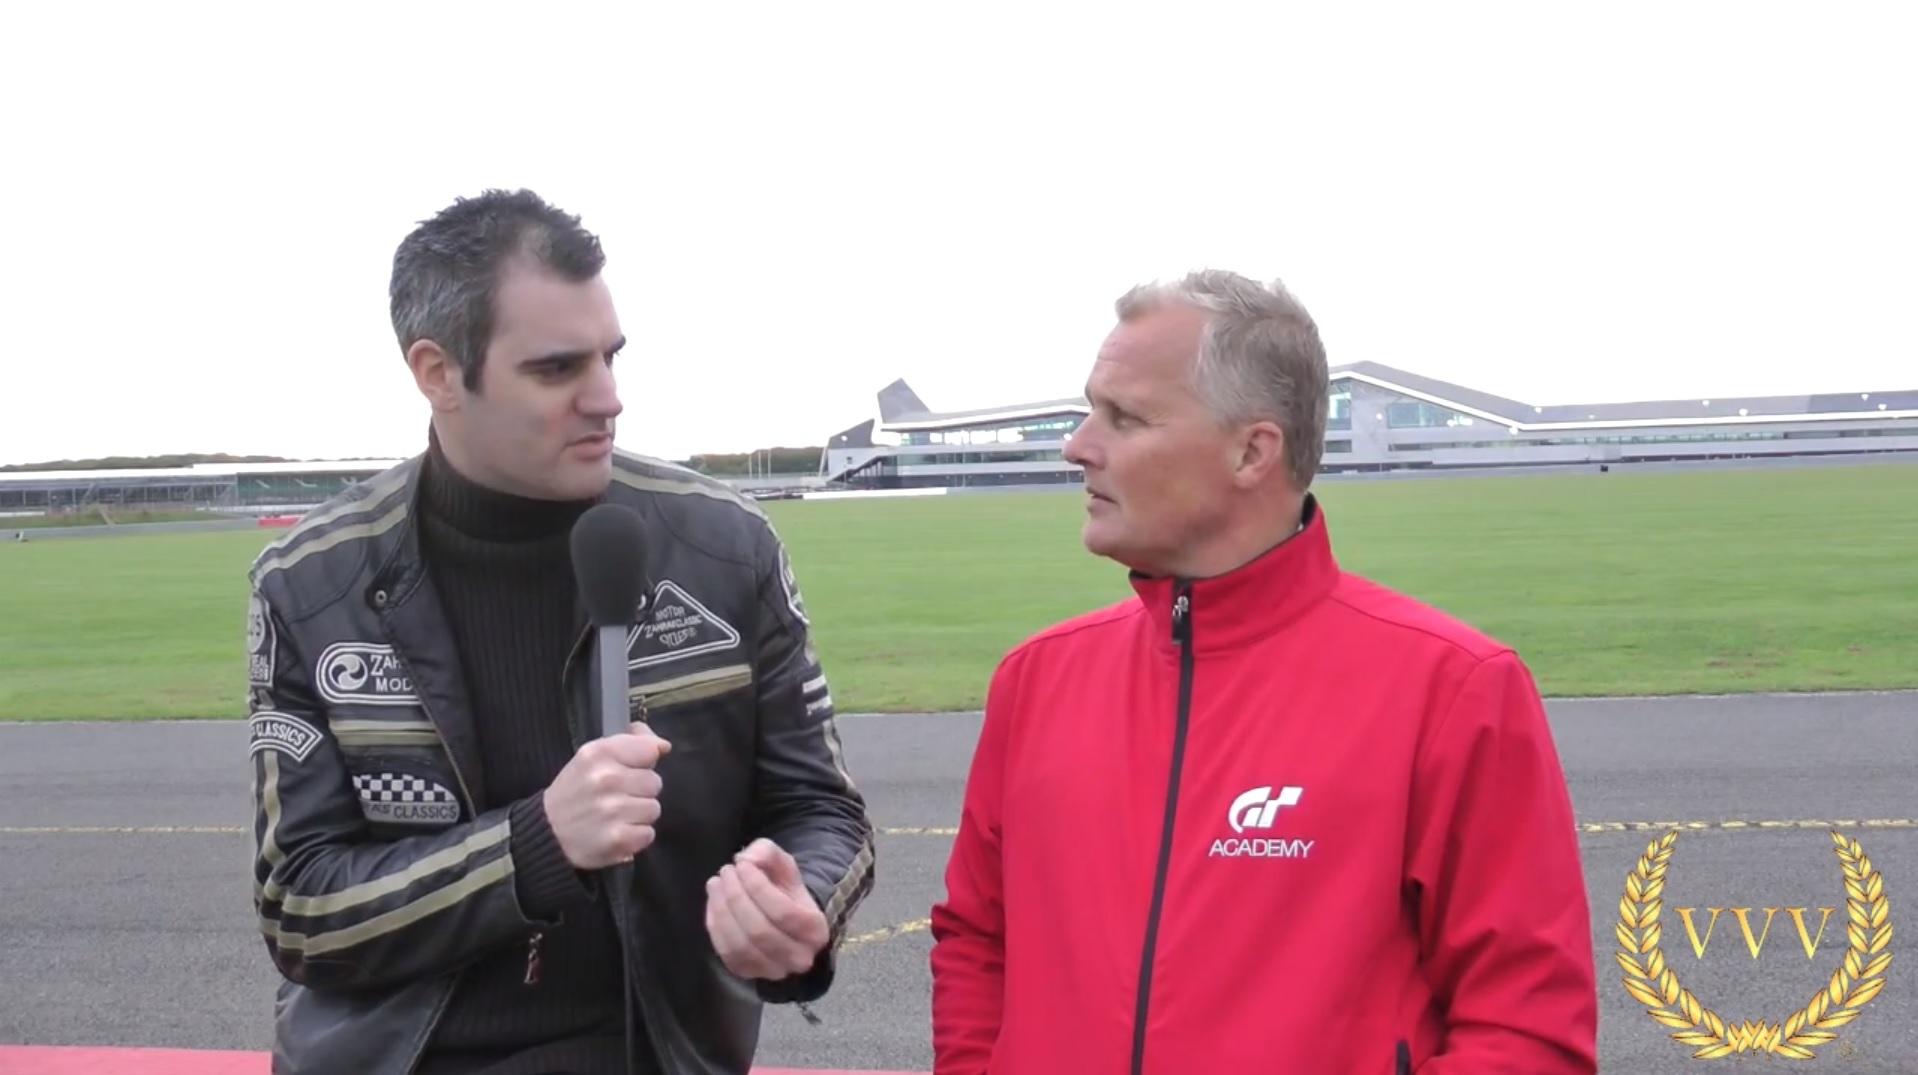 Alan interviews GT Academy judge Johnny Herbert